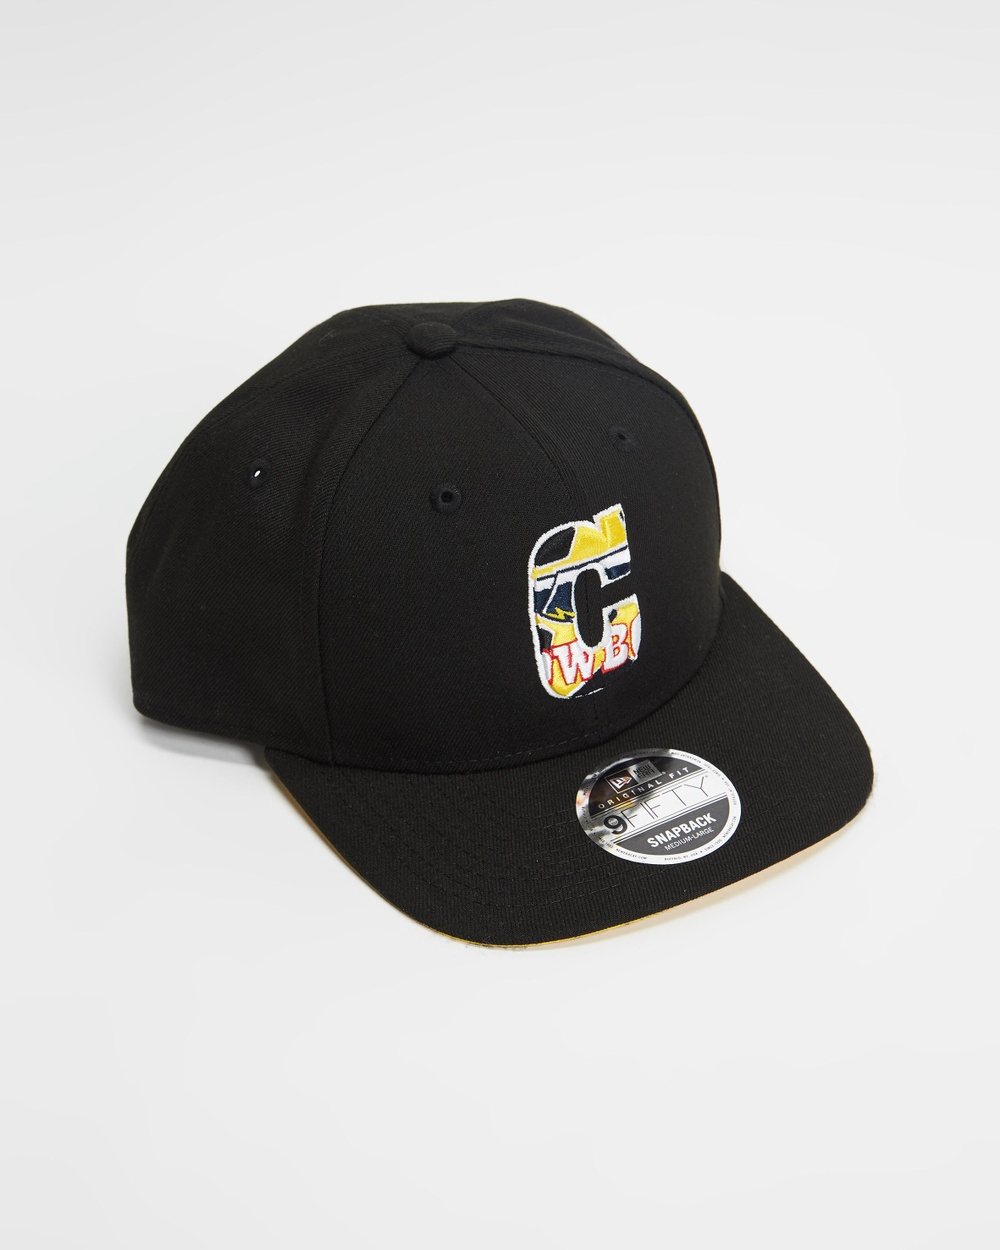 New Era North Queensland Cowboys Original Fit Headwear Black